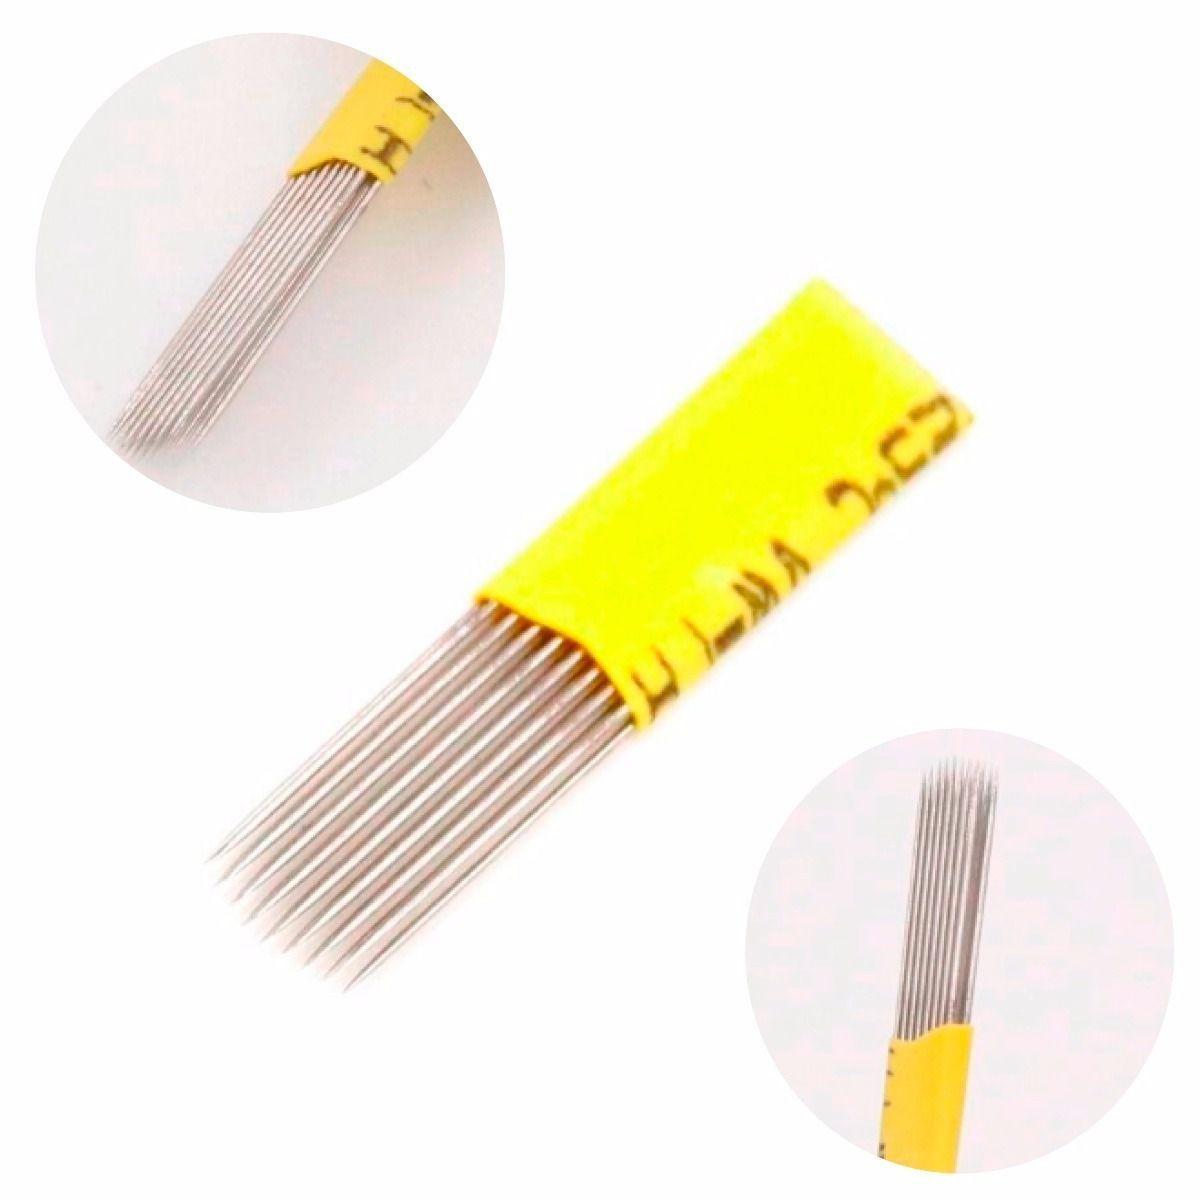 Lâmina Tebori Double Line Plana 0.25mm Kit 5un